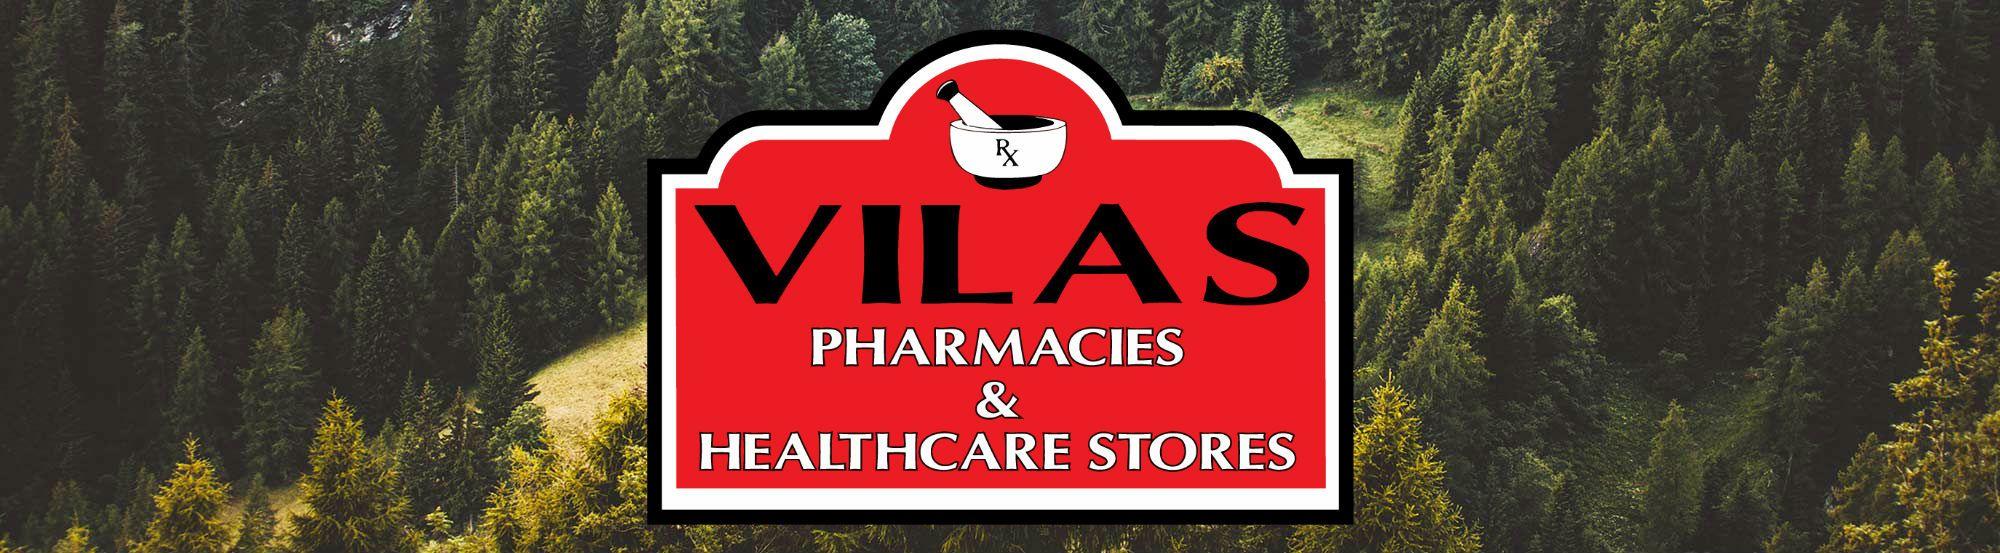 Vilas Pharmacies & Healthcare Stores